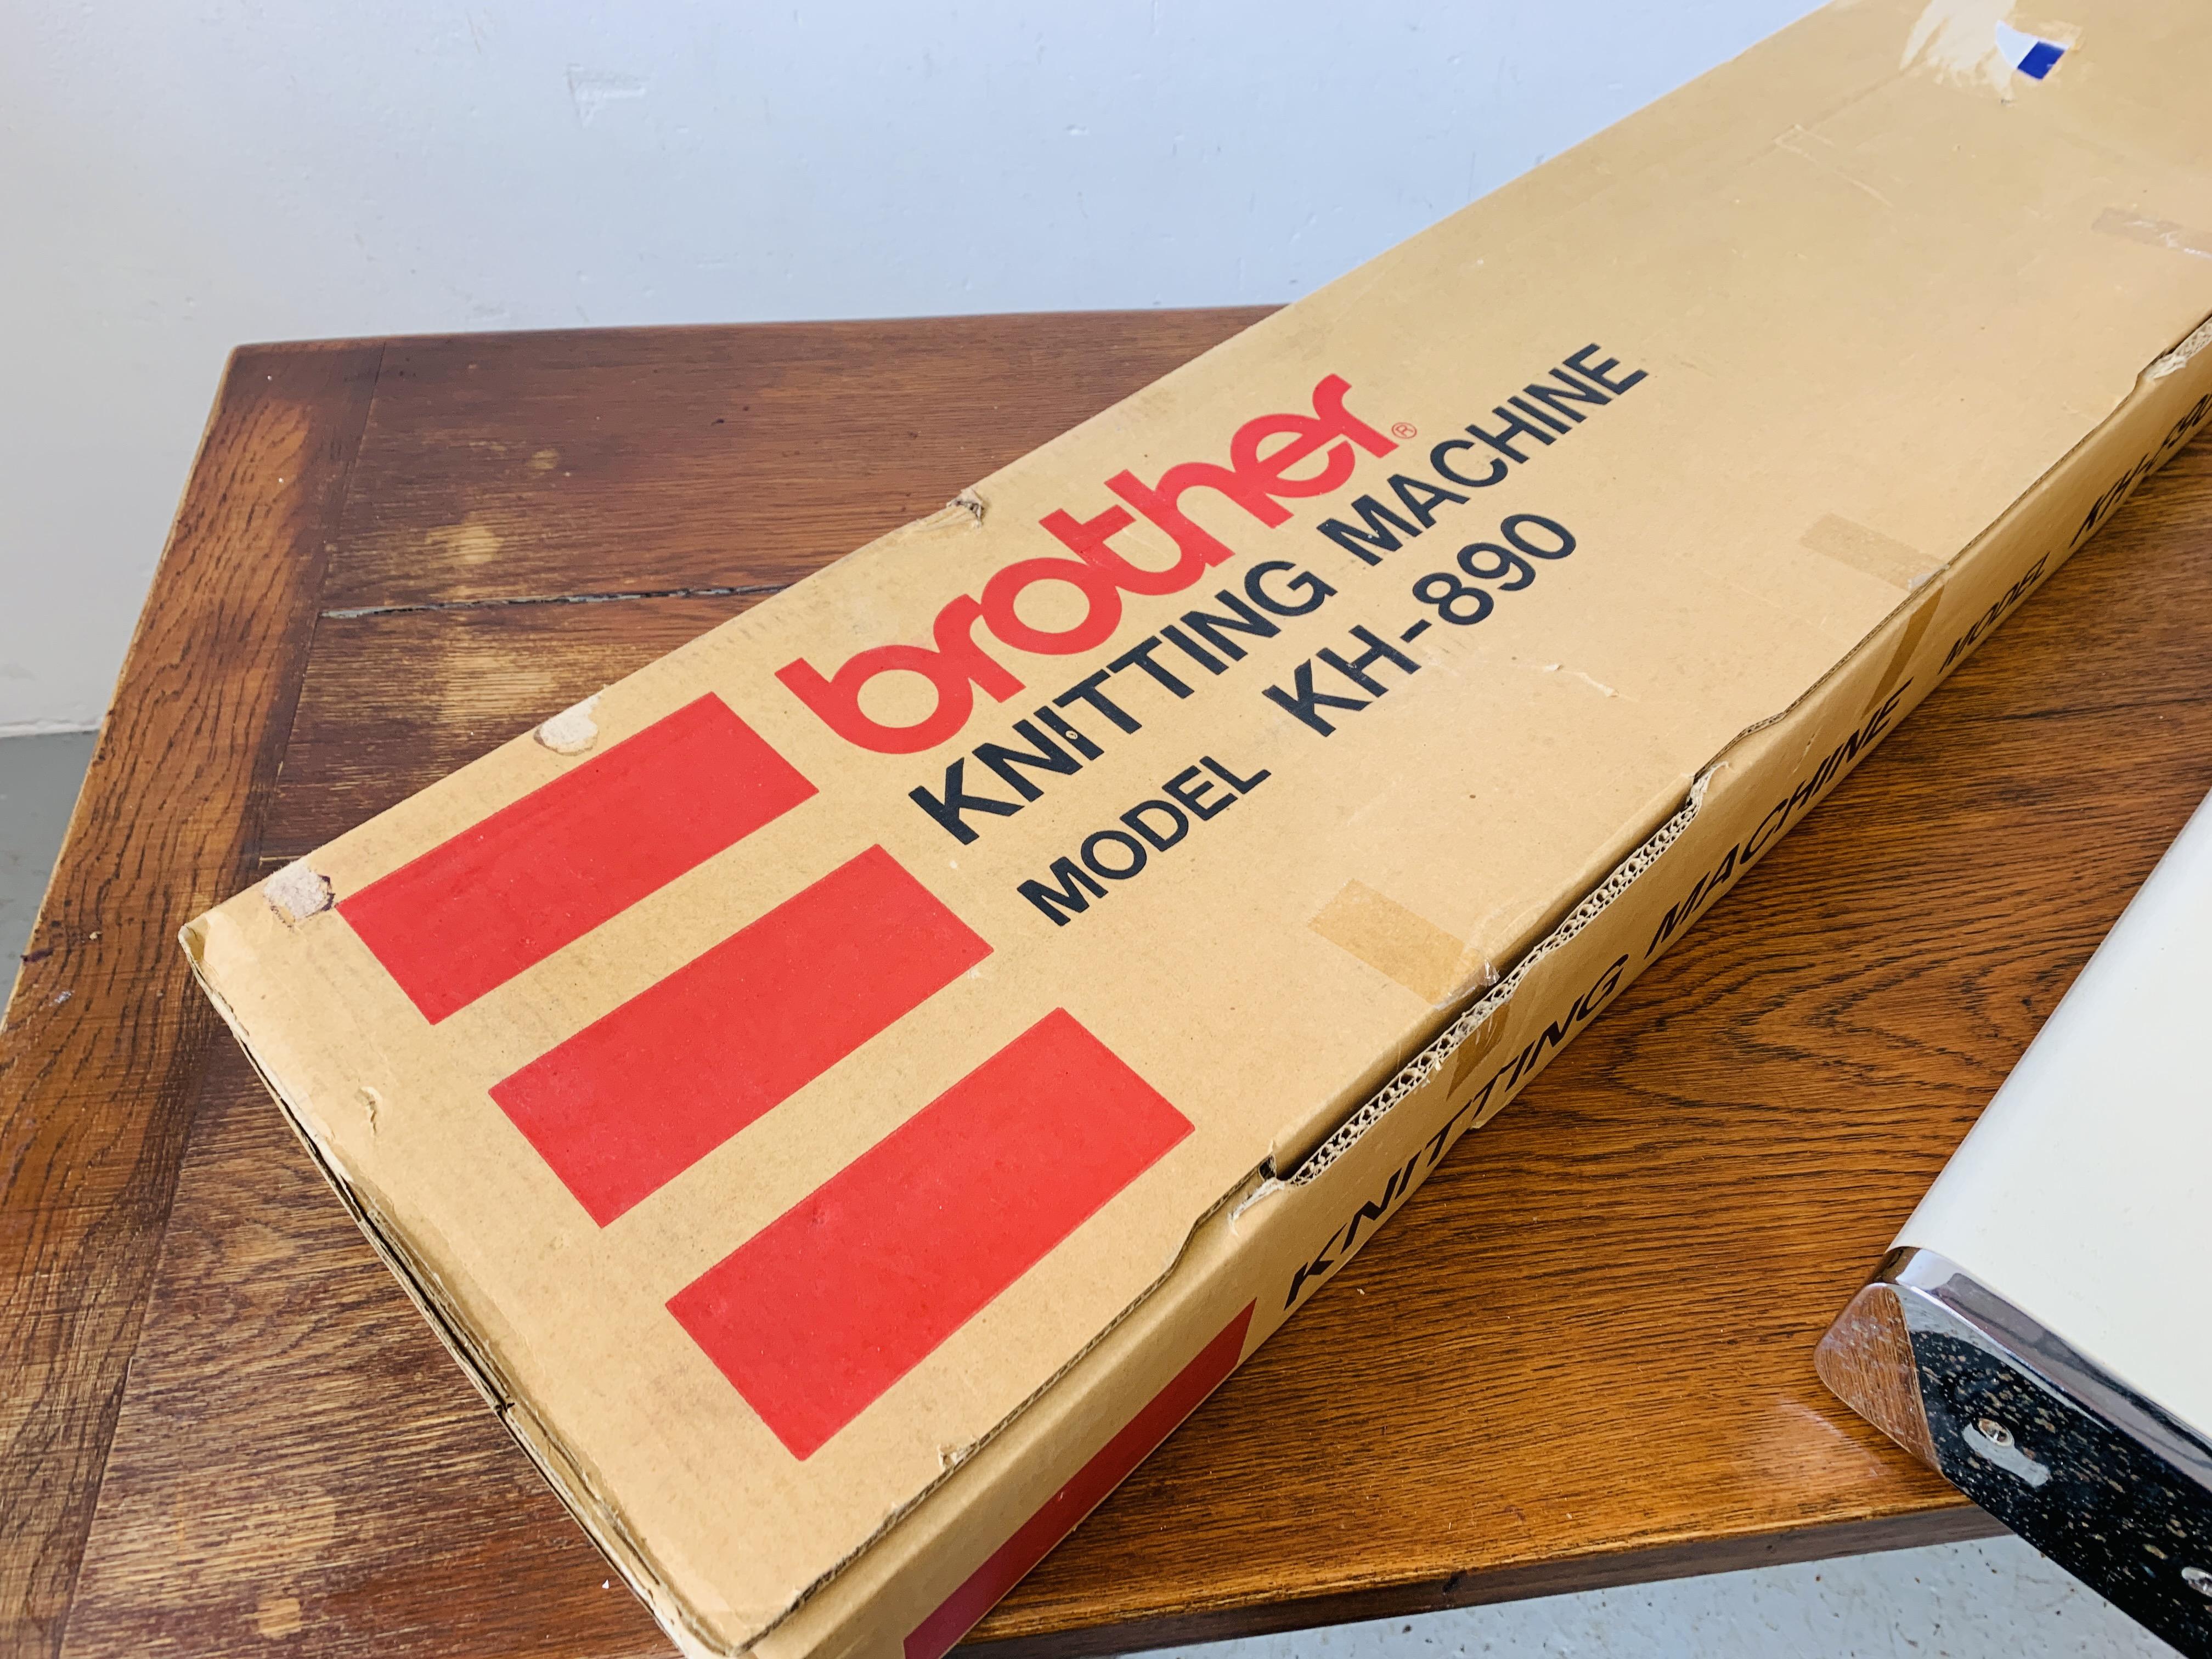 ART KITTEN KNITTING MACHINE MODE DX-1000 SERIAL NO. 97009 + BROTHER KNITTING MACHINE MODEL KH - 890. - Image 7 of 7